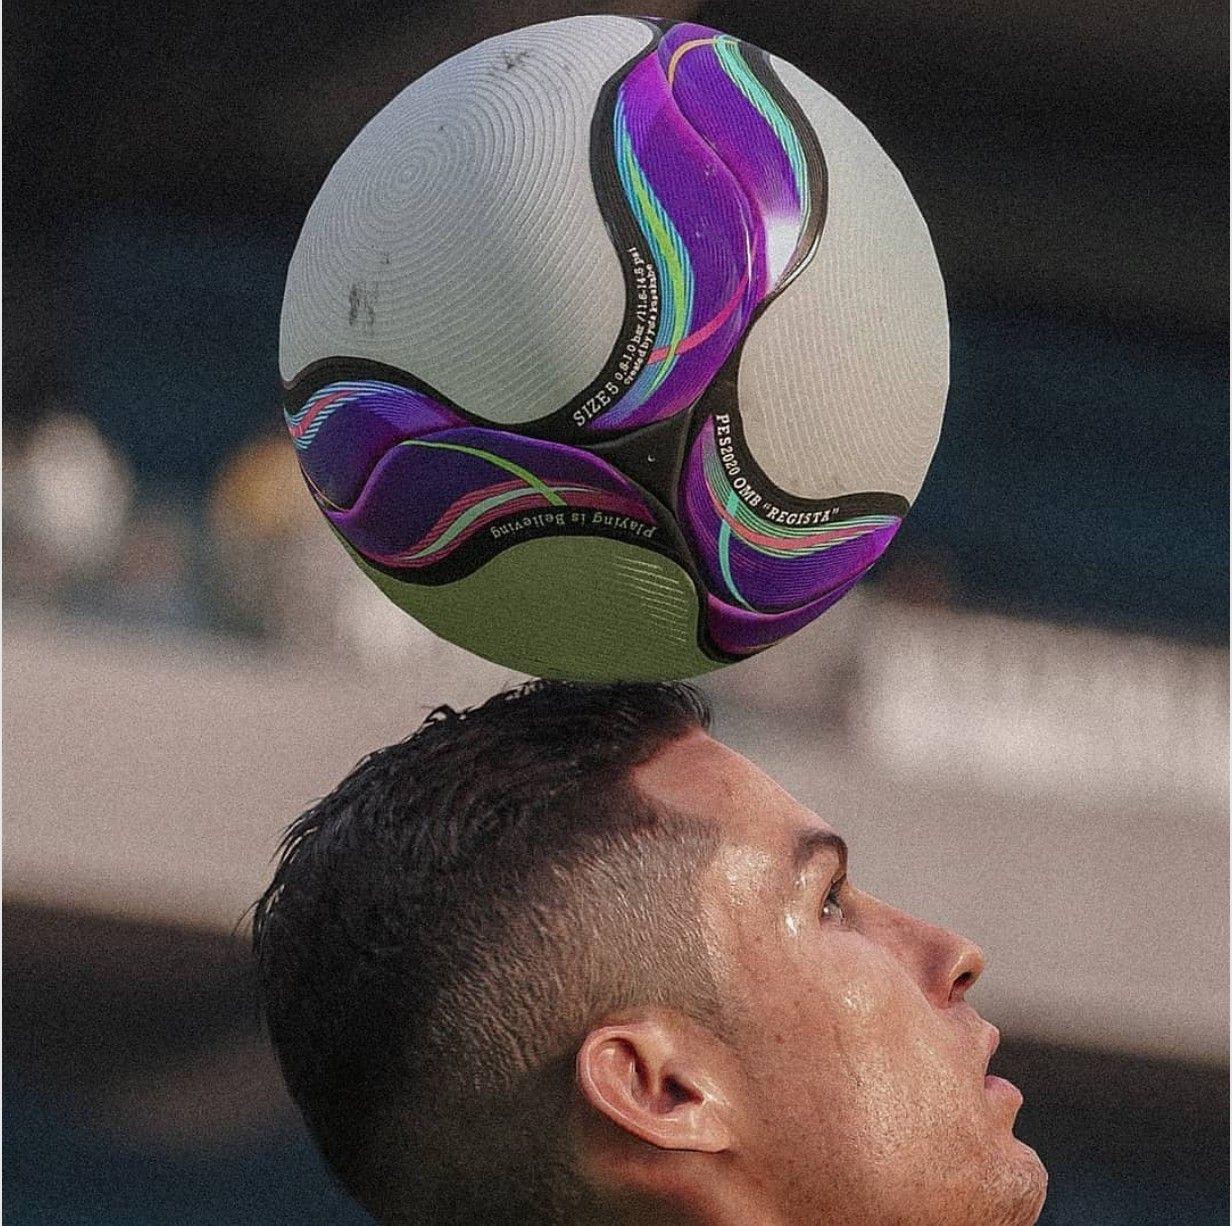 Pin by Sports Club on Jiuve la mia passione Soccer ball